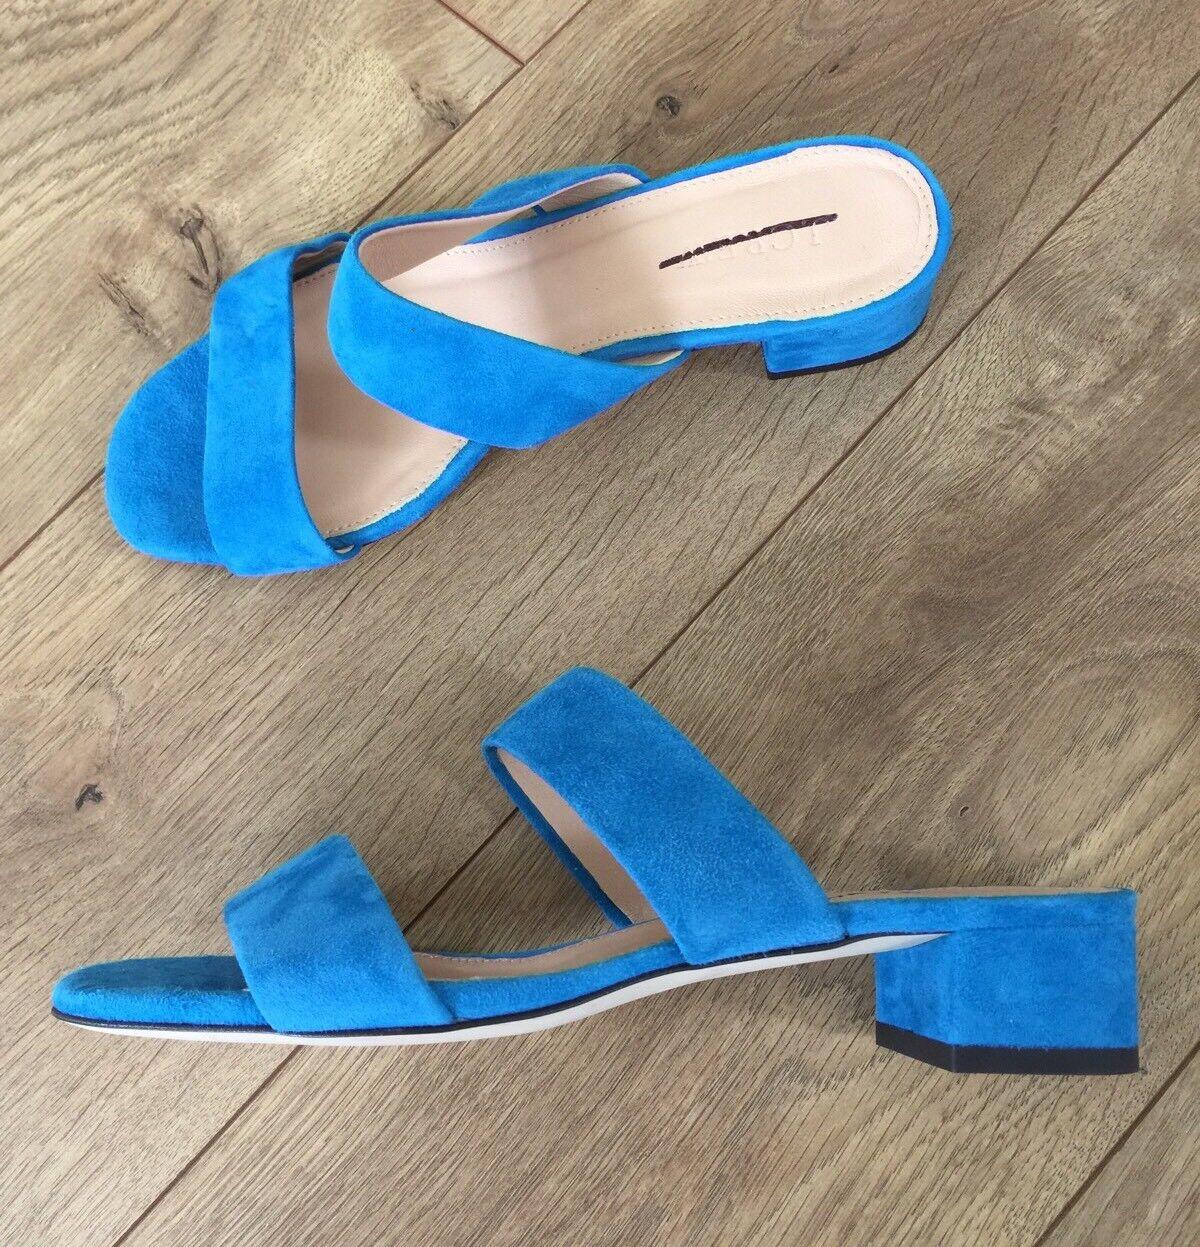 Jcrew  128 diapositivas de gamuza doble correa sandalia sandalia sandalia Tacones Altos Talla 7 Cabana Azul G0970 Nuevo  más vendido